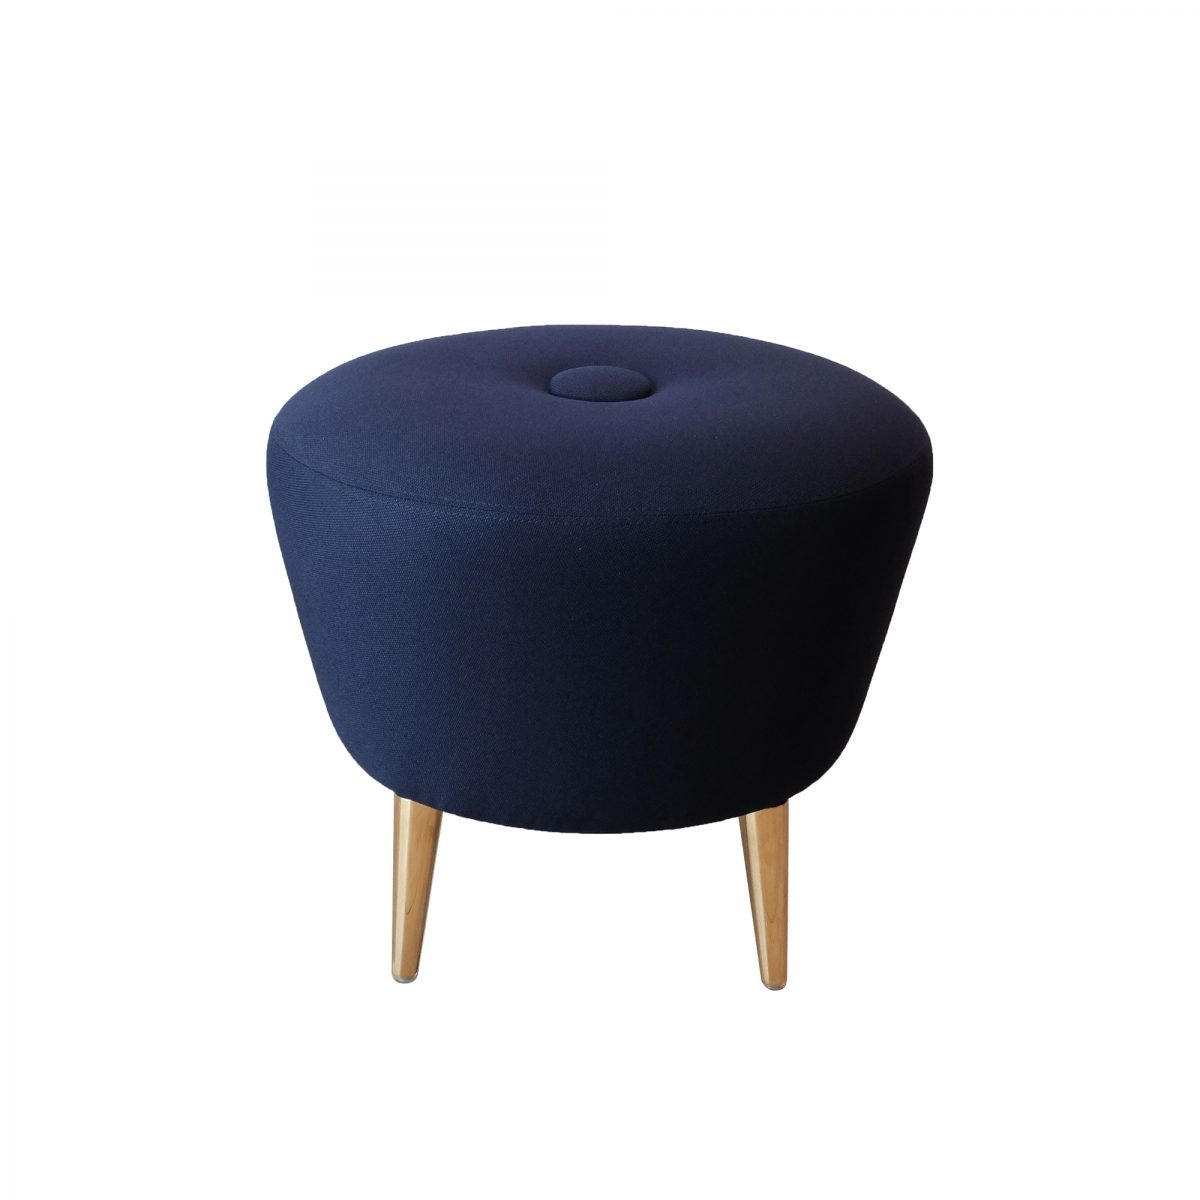 1-maison-dada-ayi-ottoman-seaters-stools&ottomans-blue